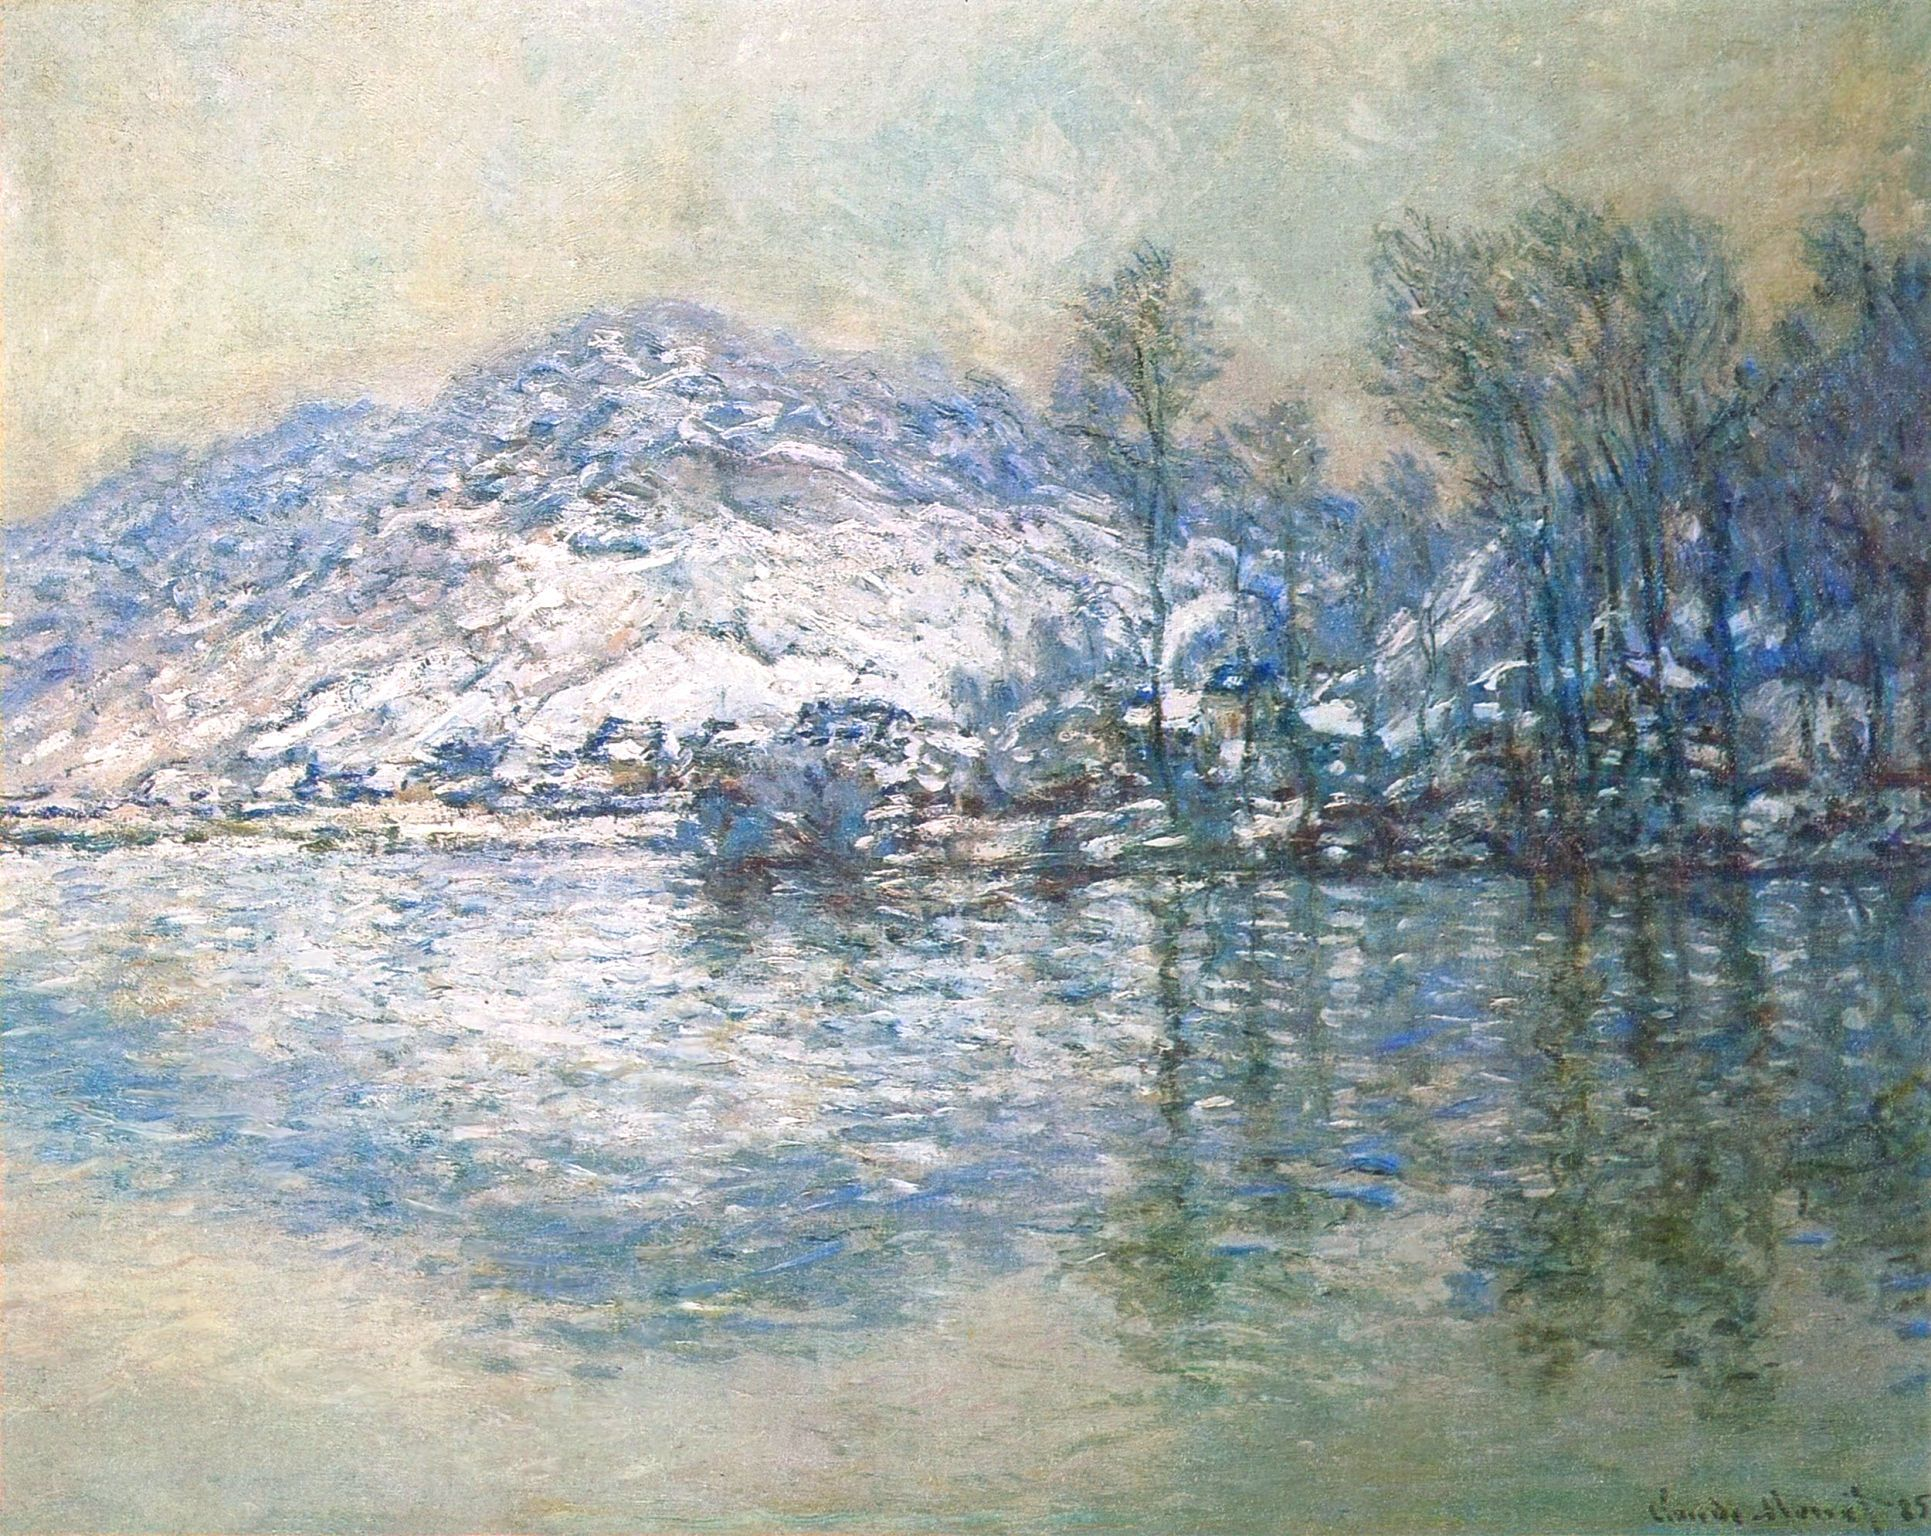 The Seine at Port Villez, Snow Effect, 1885 - Claude Monet | Claude monet  paintings, Monet art, Artist monet